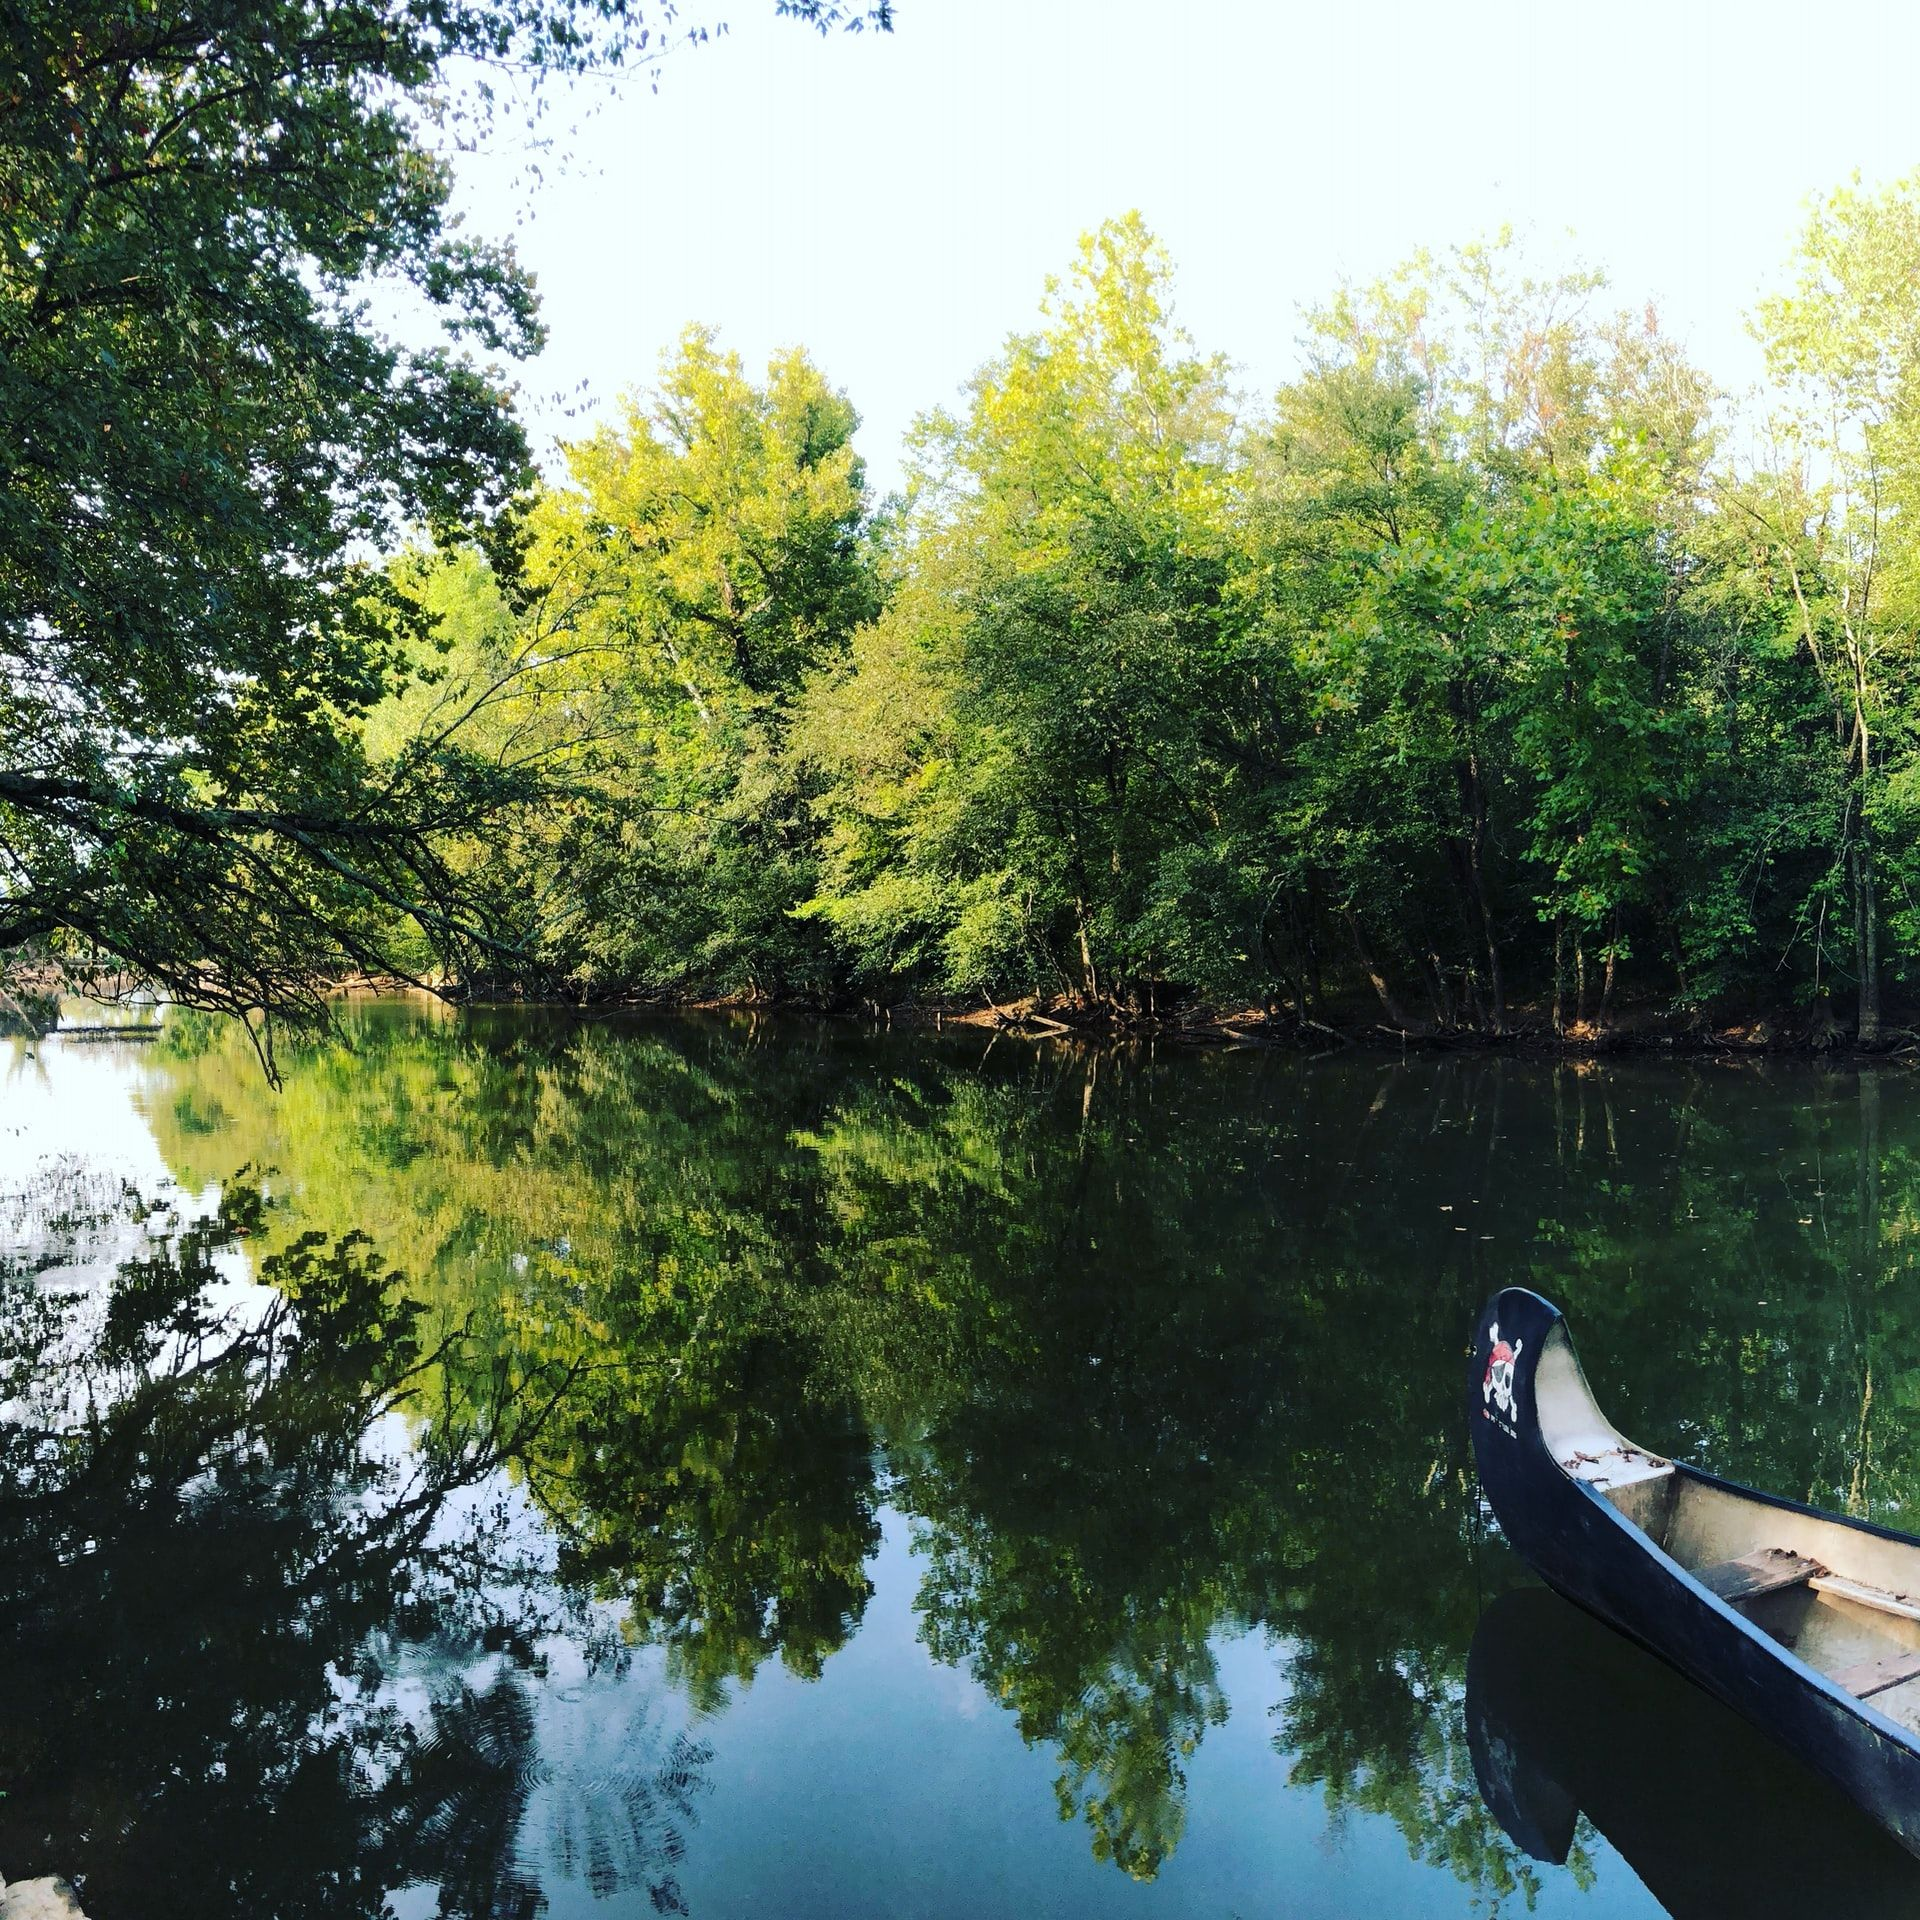 The Chesapeake and Ohio Canal Washington USA